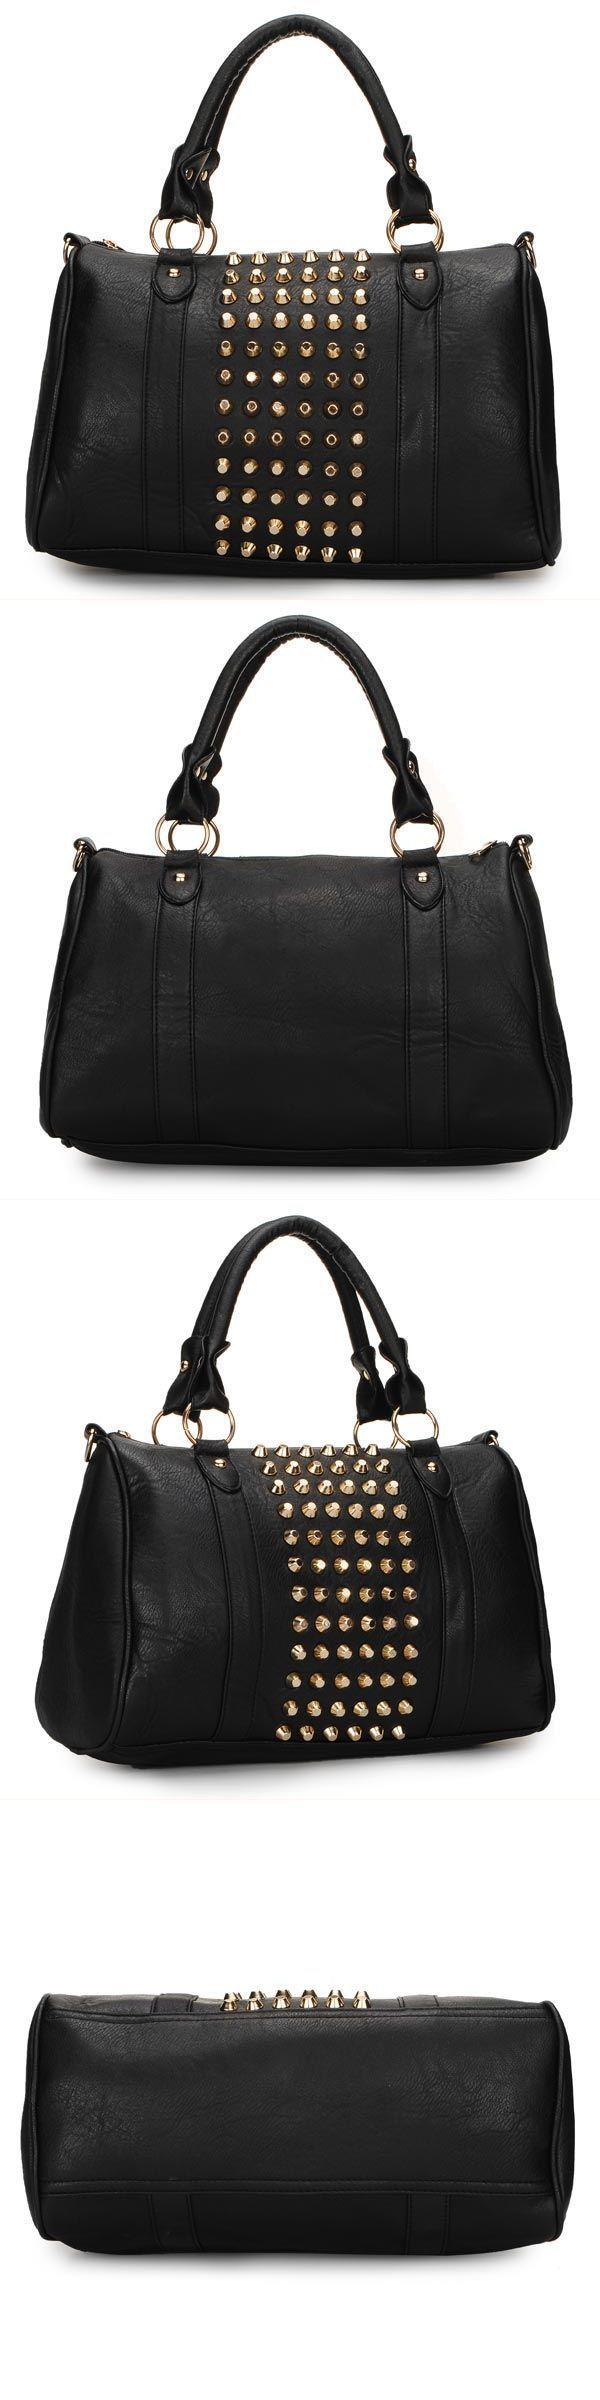 Fashion Punk Style Bag Women Handbag Rivets Barrel Shoulder Handbags 4 Wags 9